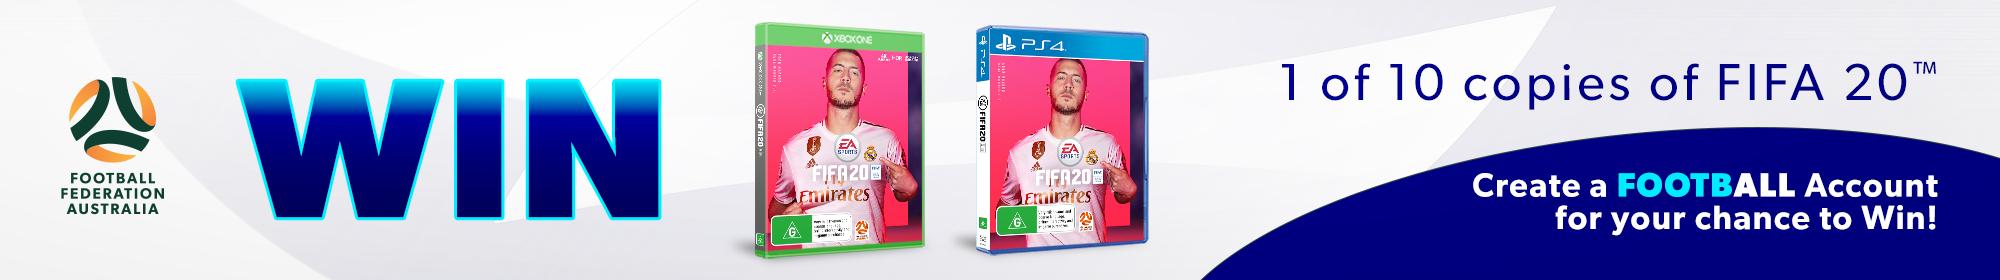 Win FIFA 20